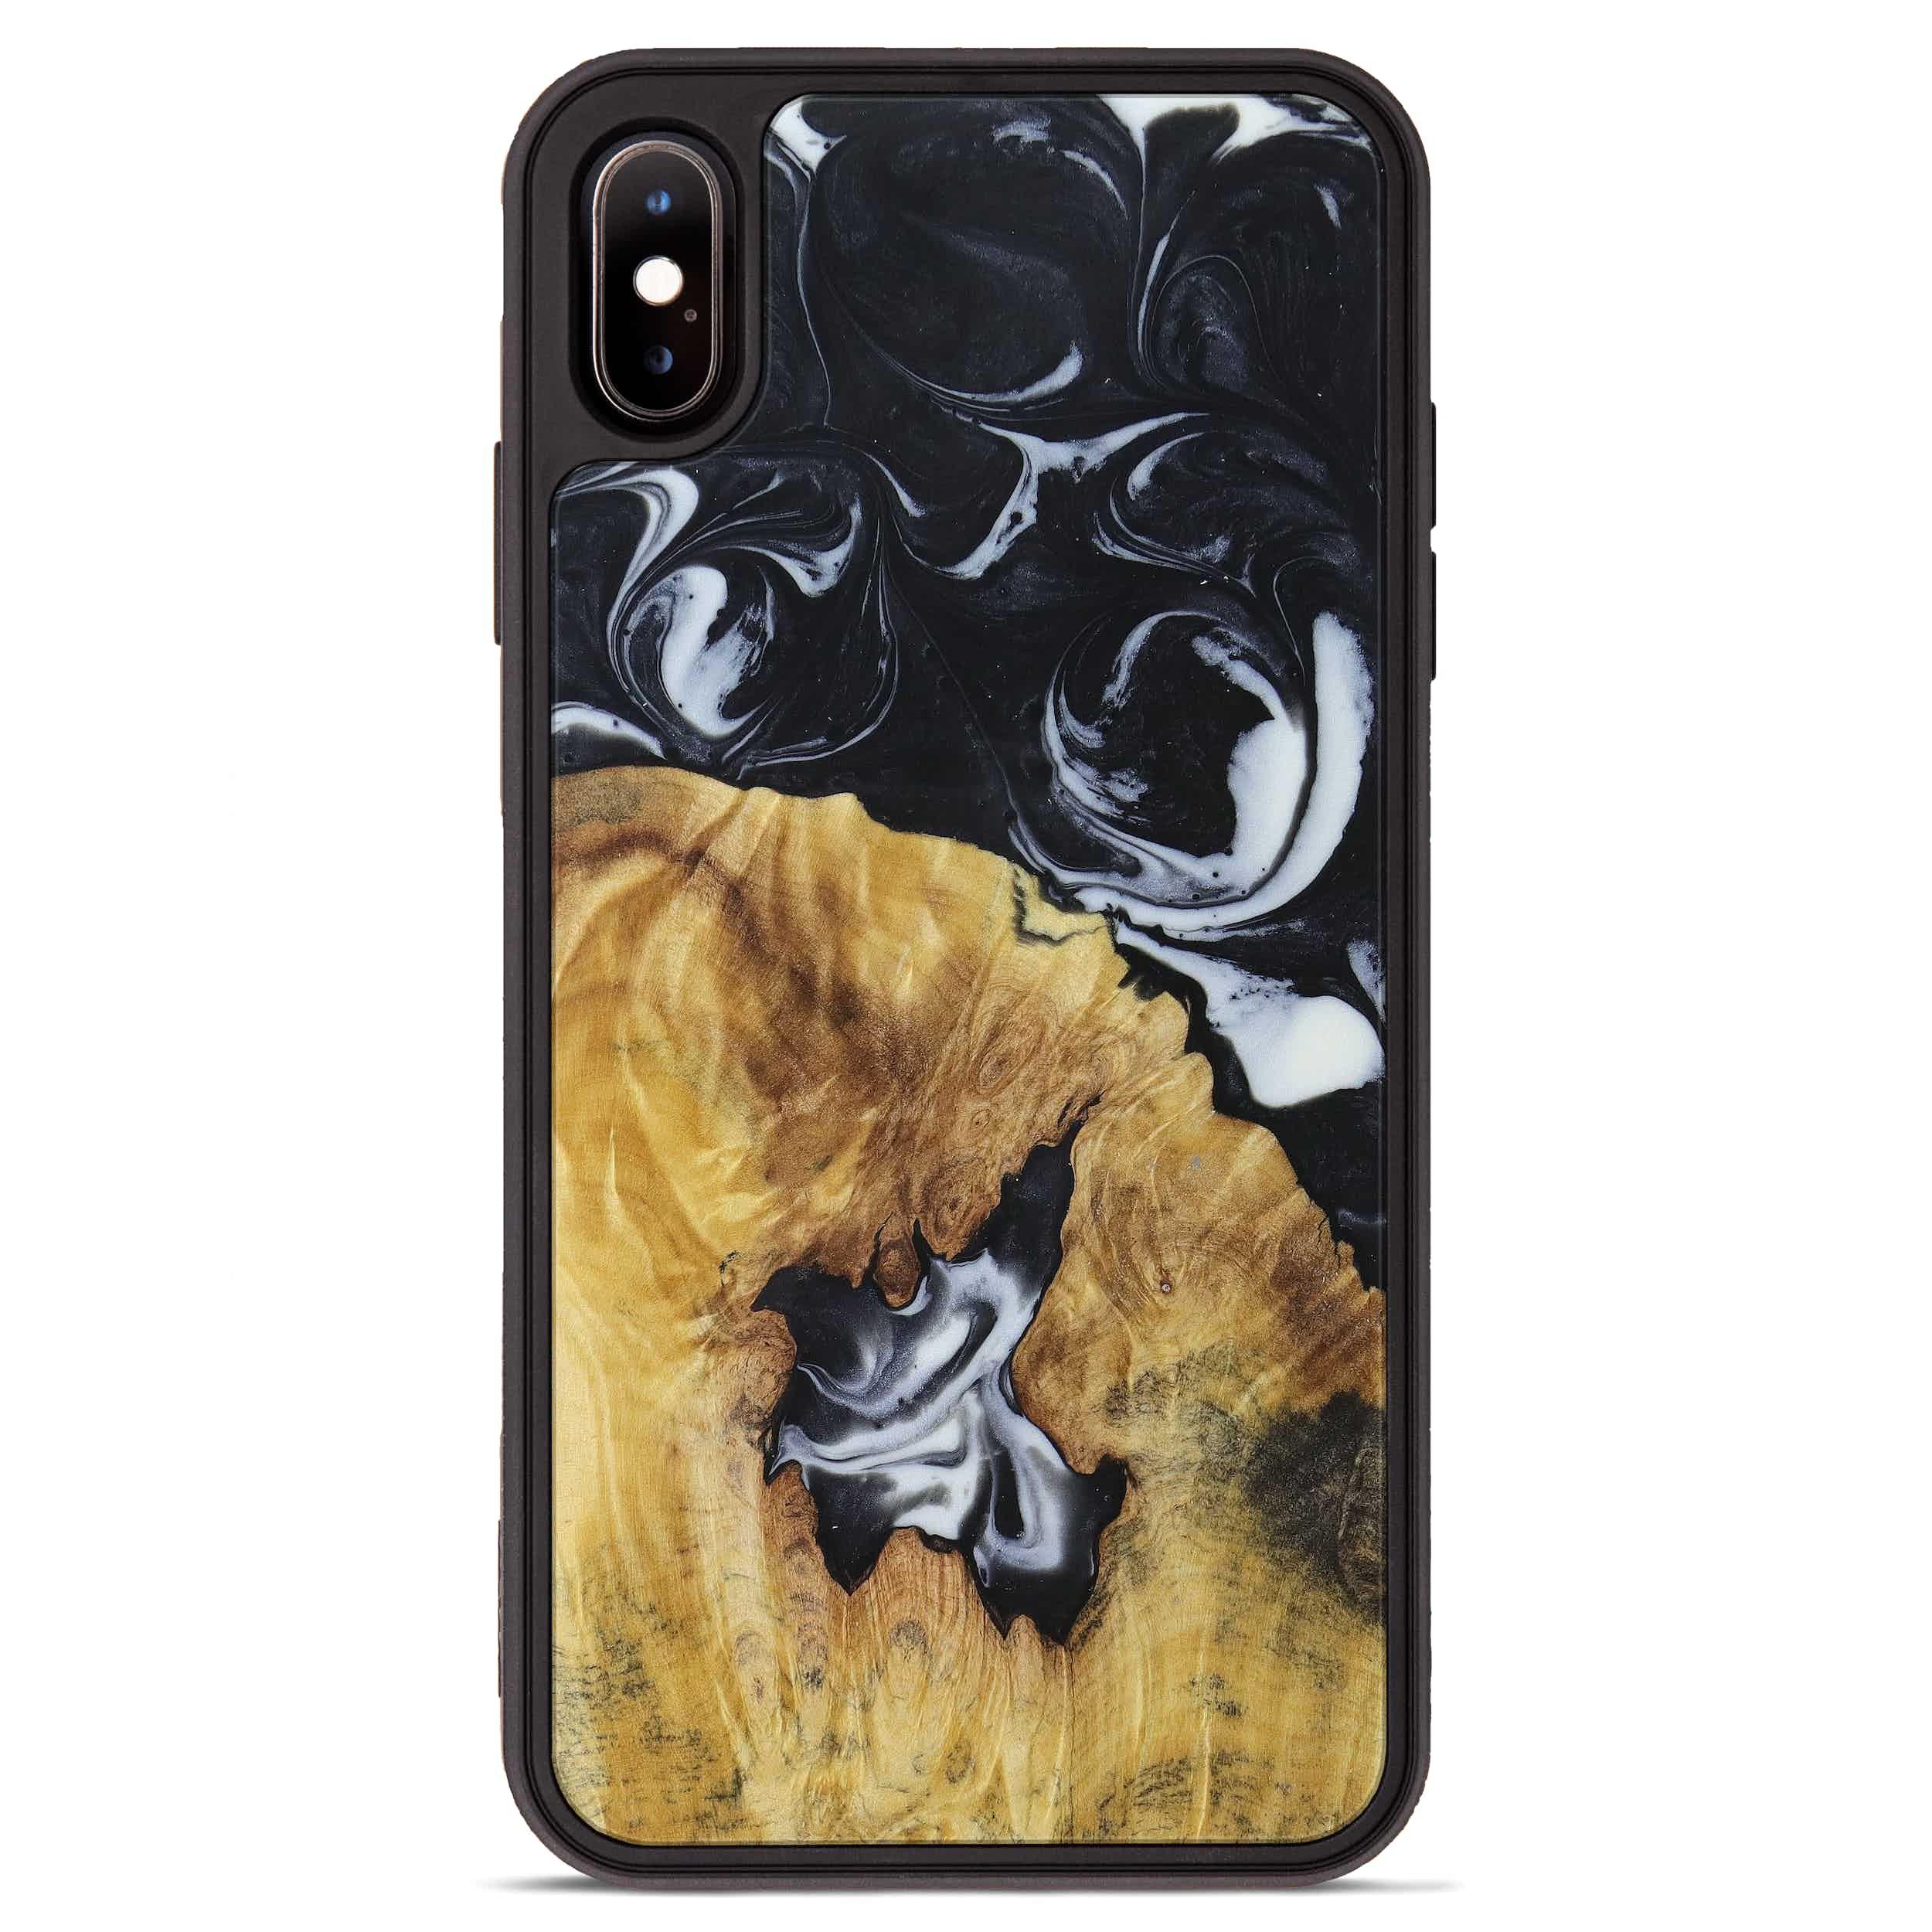 iPhone Xs Max Wood+Resin Phone Case - Imogene (Black & White, 397368)